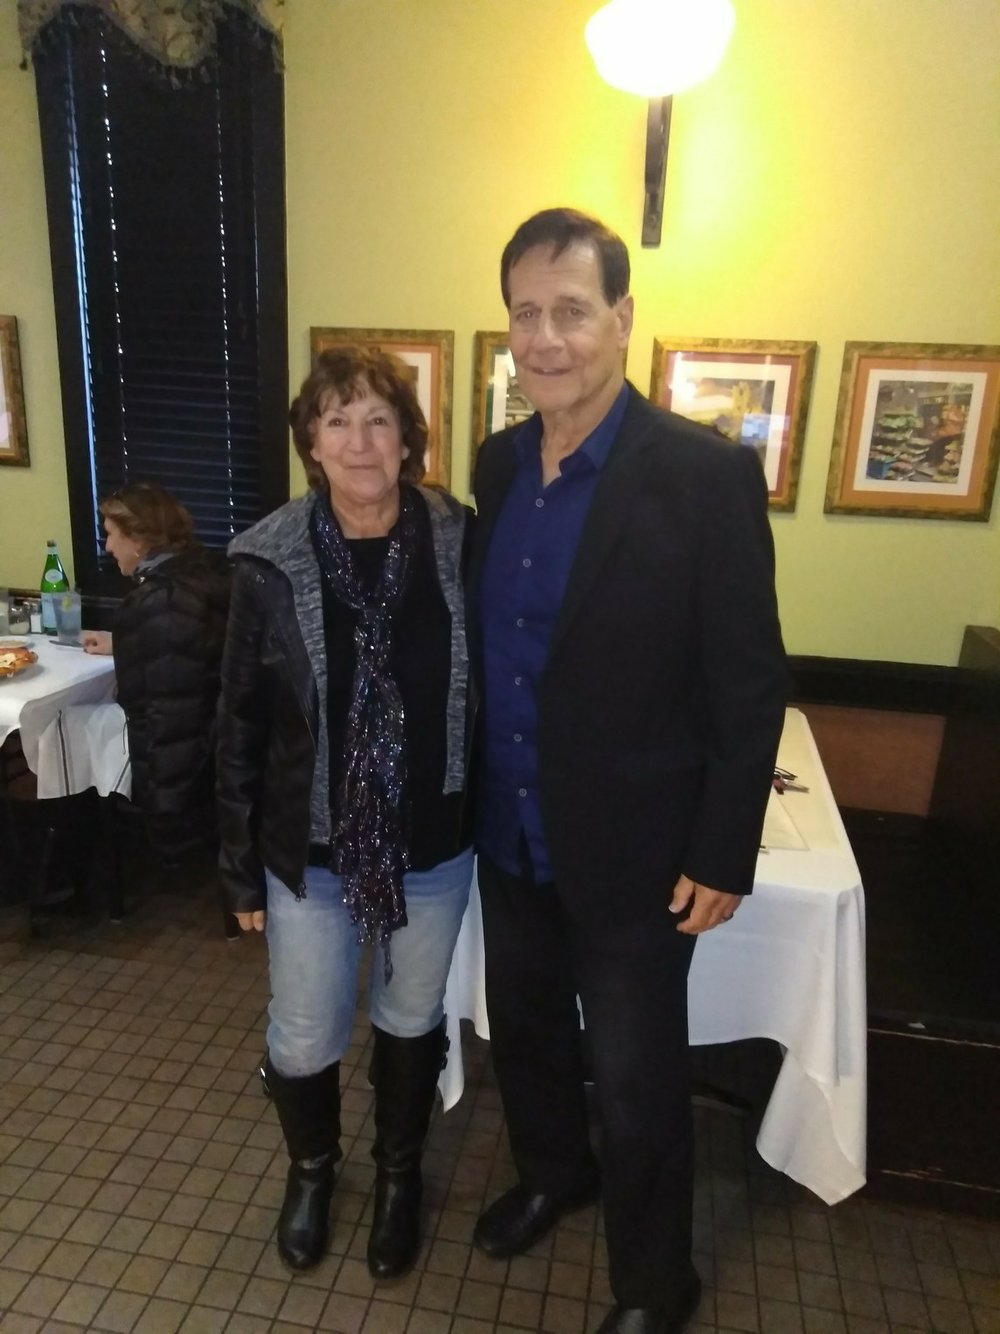 Pastors Joe and Marie Artese